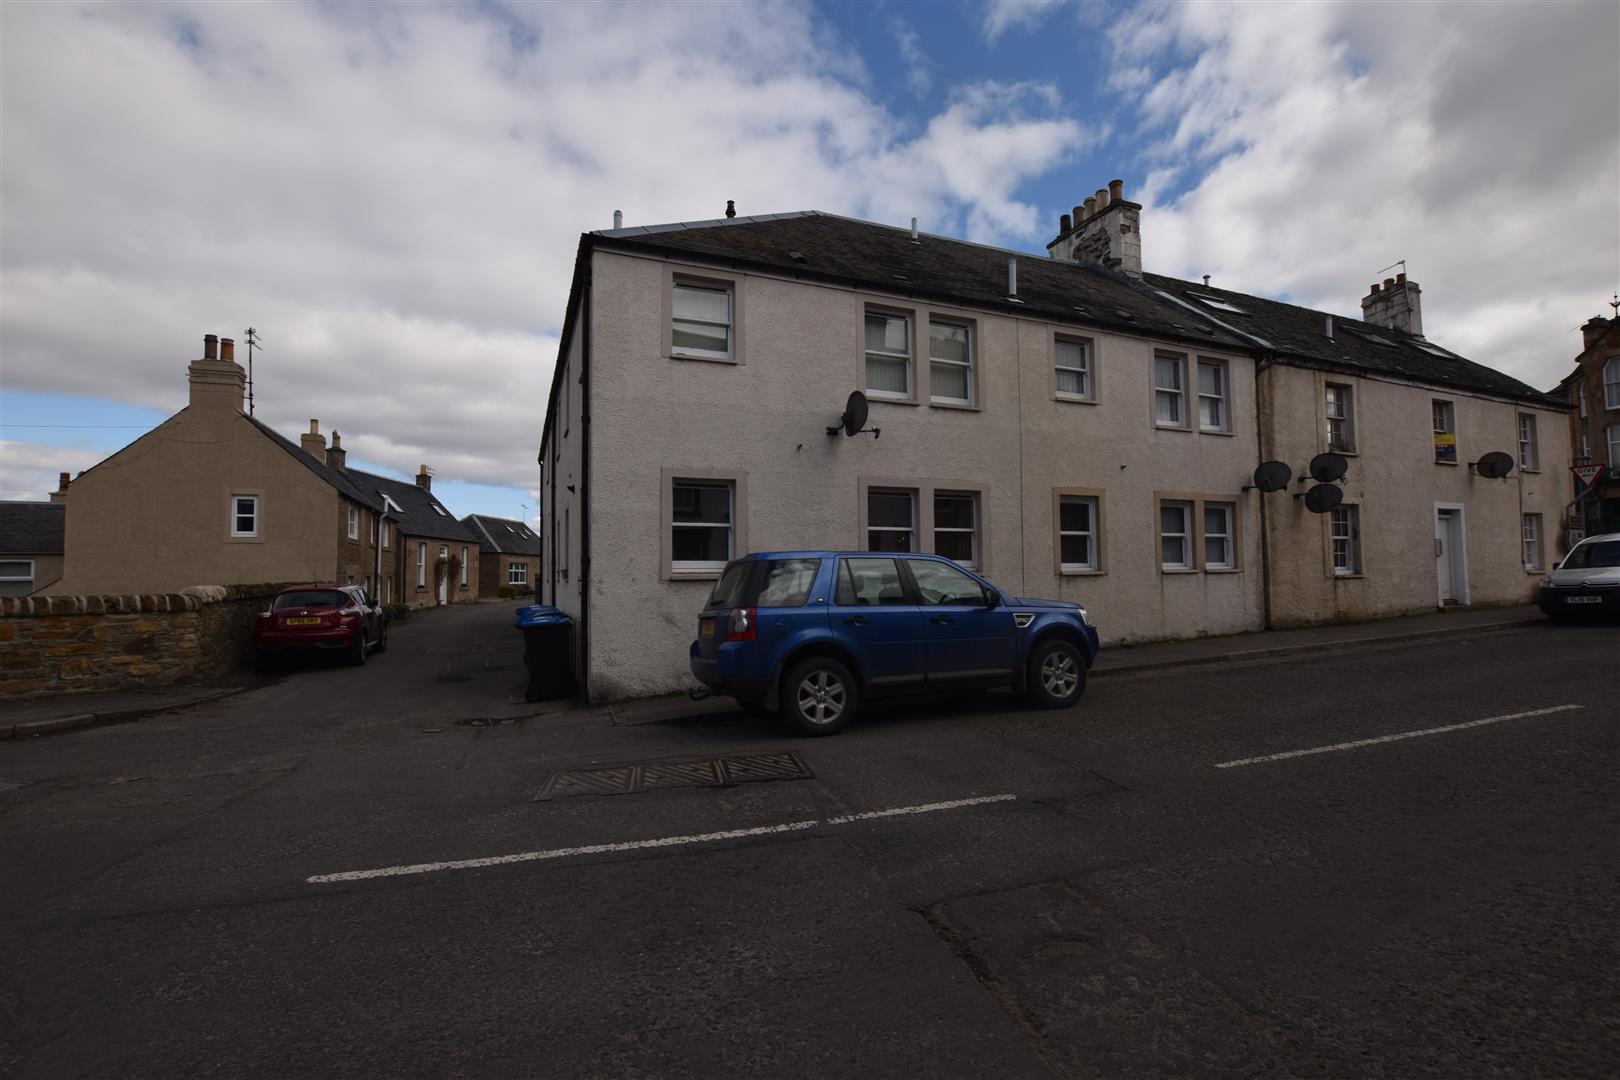 Flat 6, Earnview, Circus Street, Dunning, Perthshire, PH2 0RQ, UK